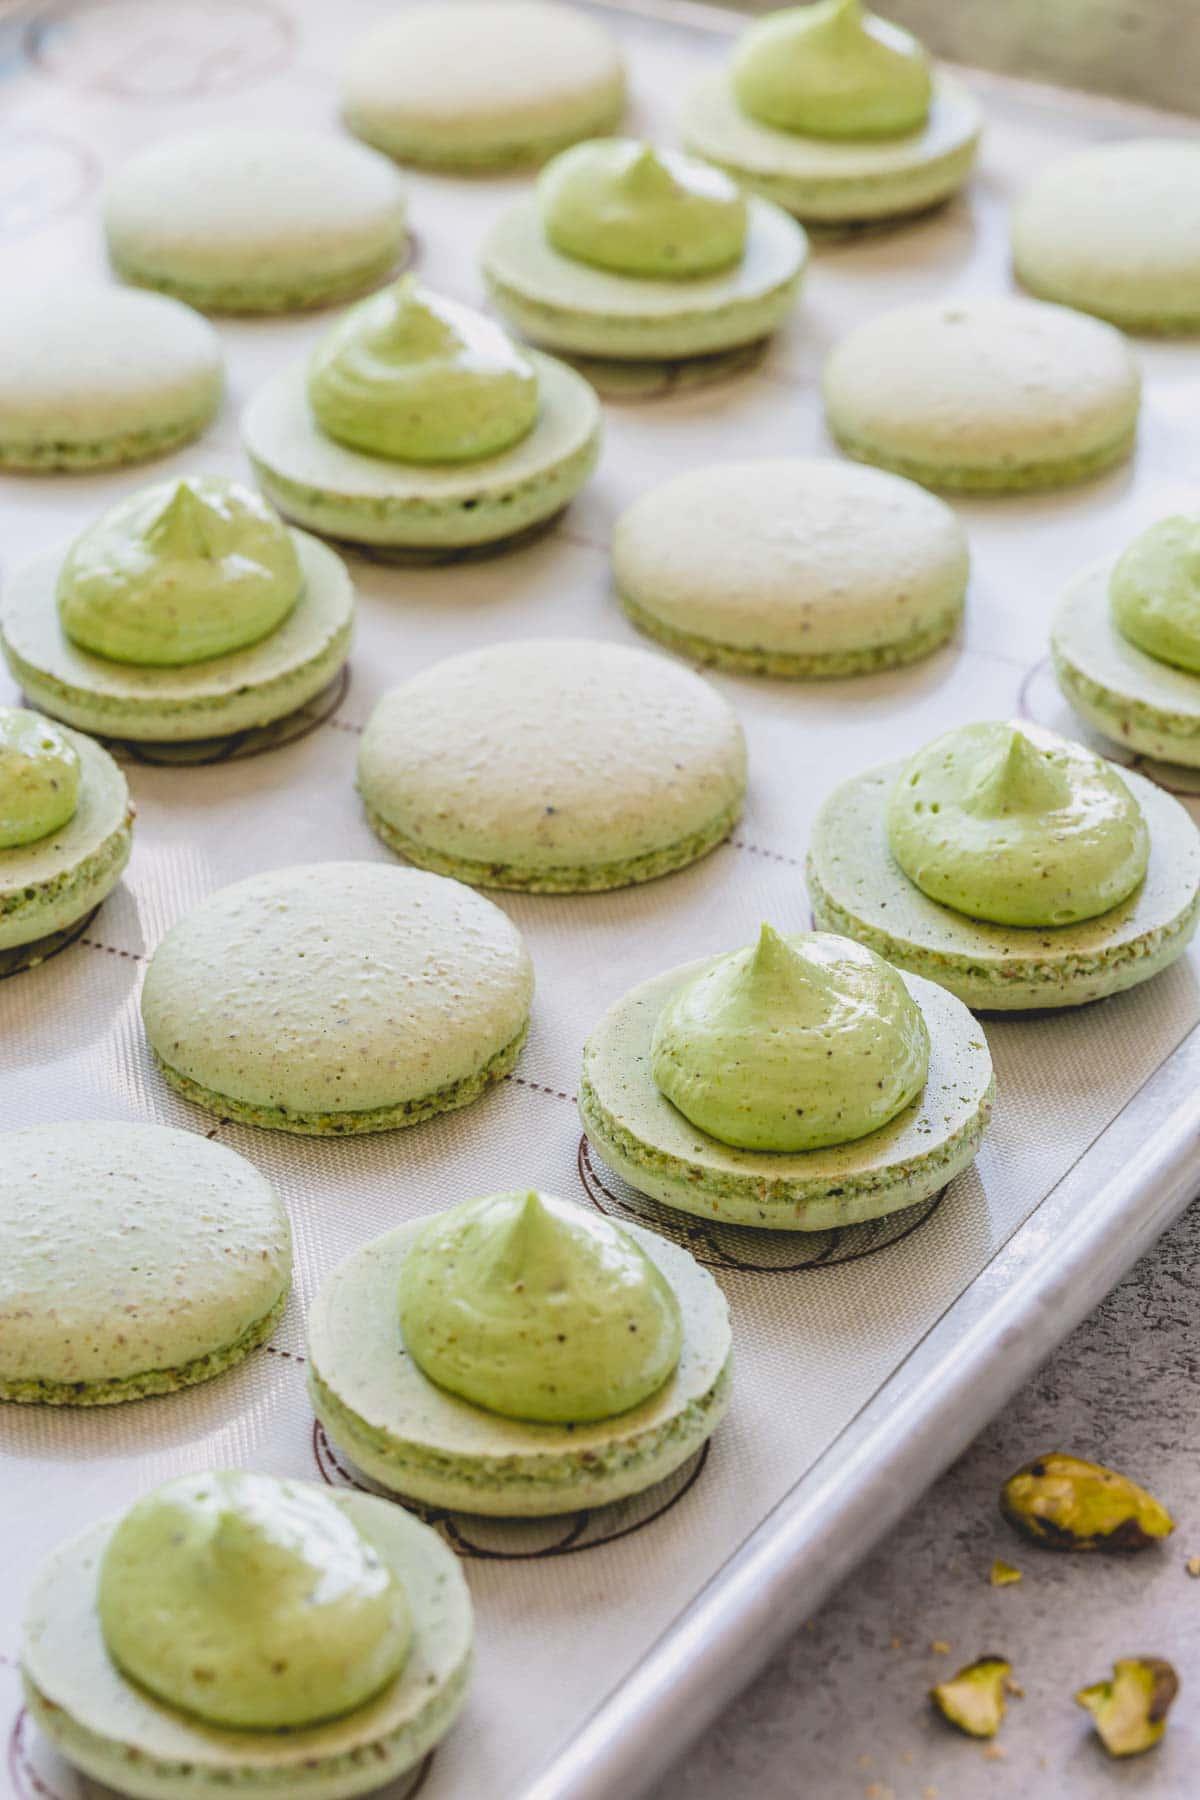 open pistachio shells with a dollop of pistachio cream filling